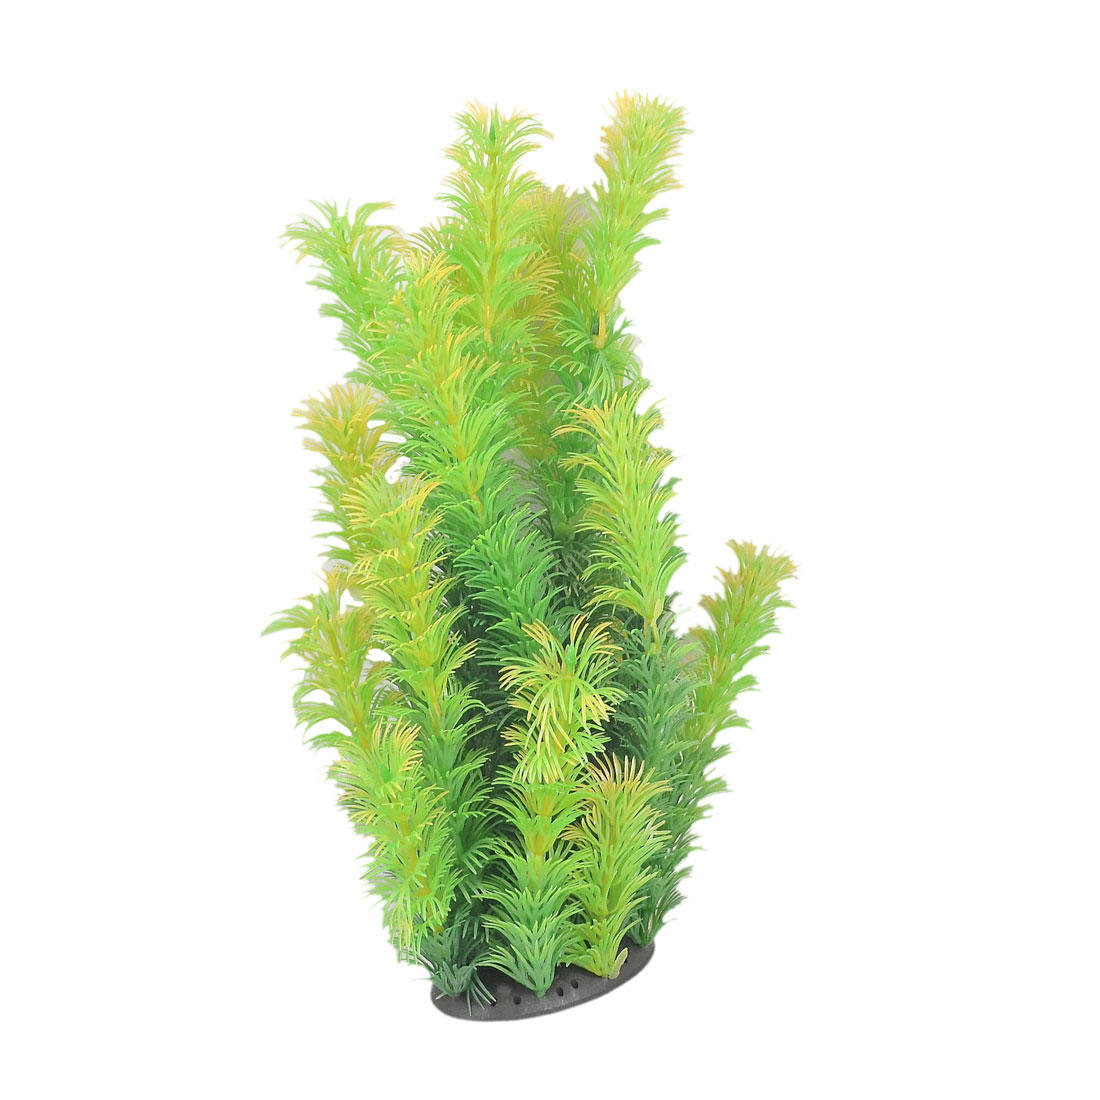 "Fish Tank Decoration 9.8"" Height Plastic Green Yellow Leaf Aquatic Plant"